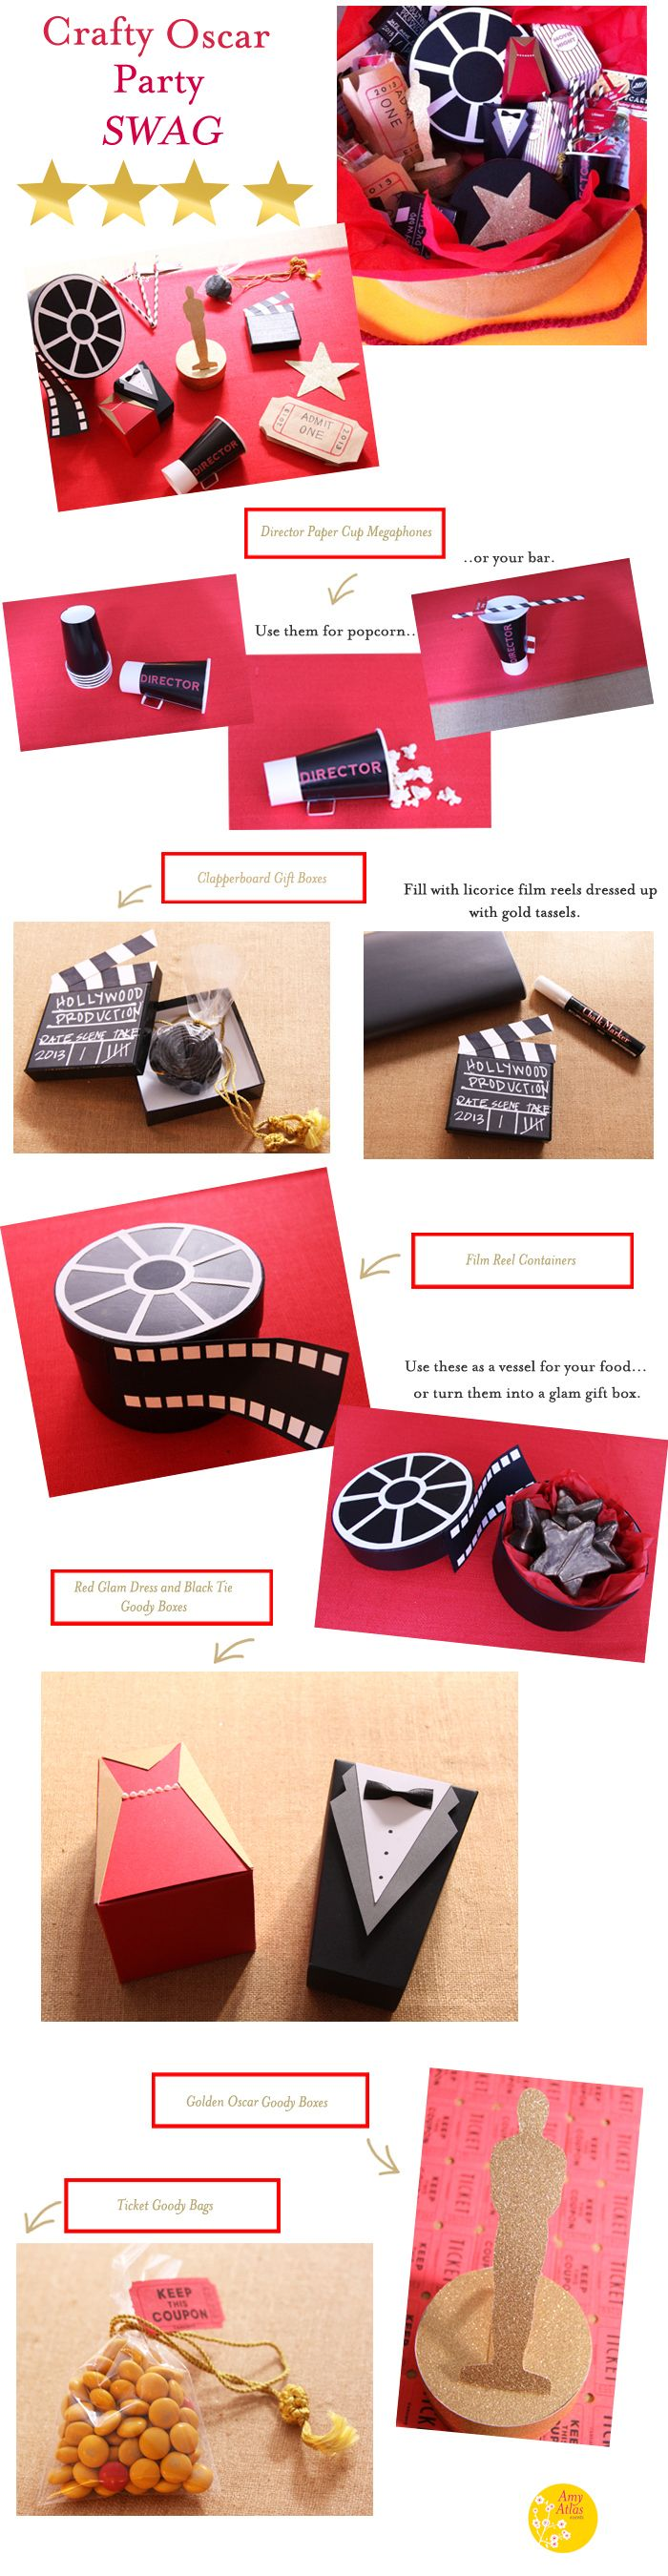 Crafty Oscar Party Gift Bag Ideas | Amy Atlas Events